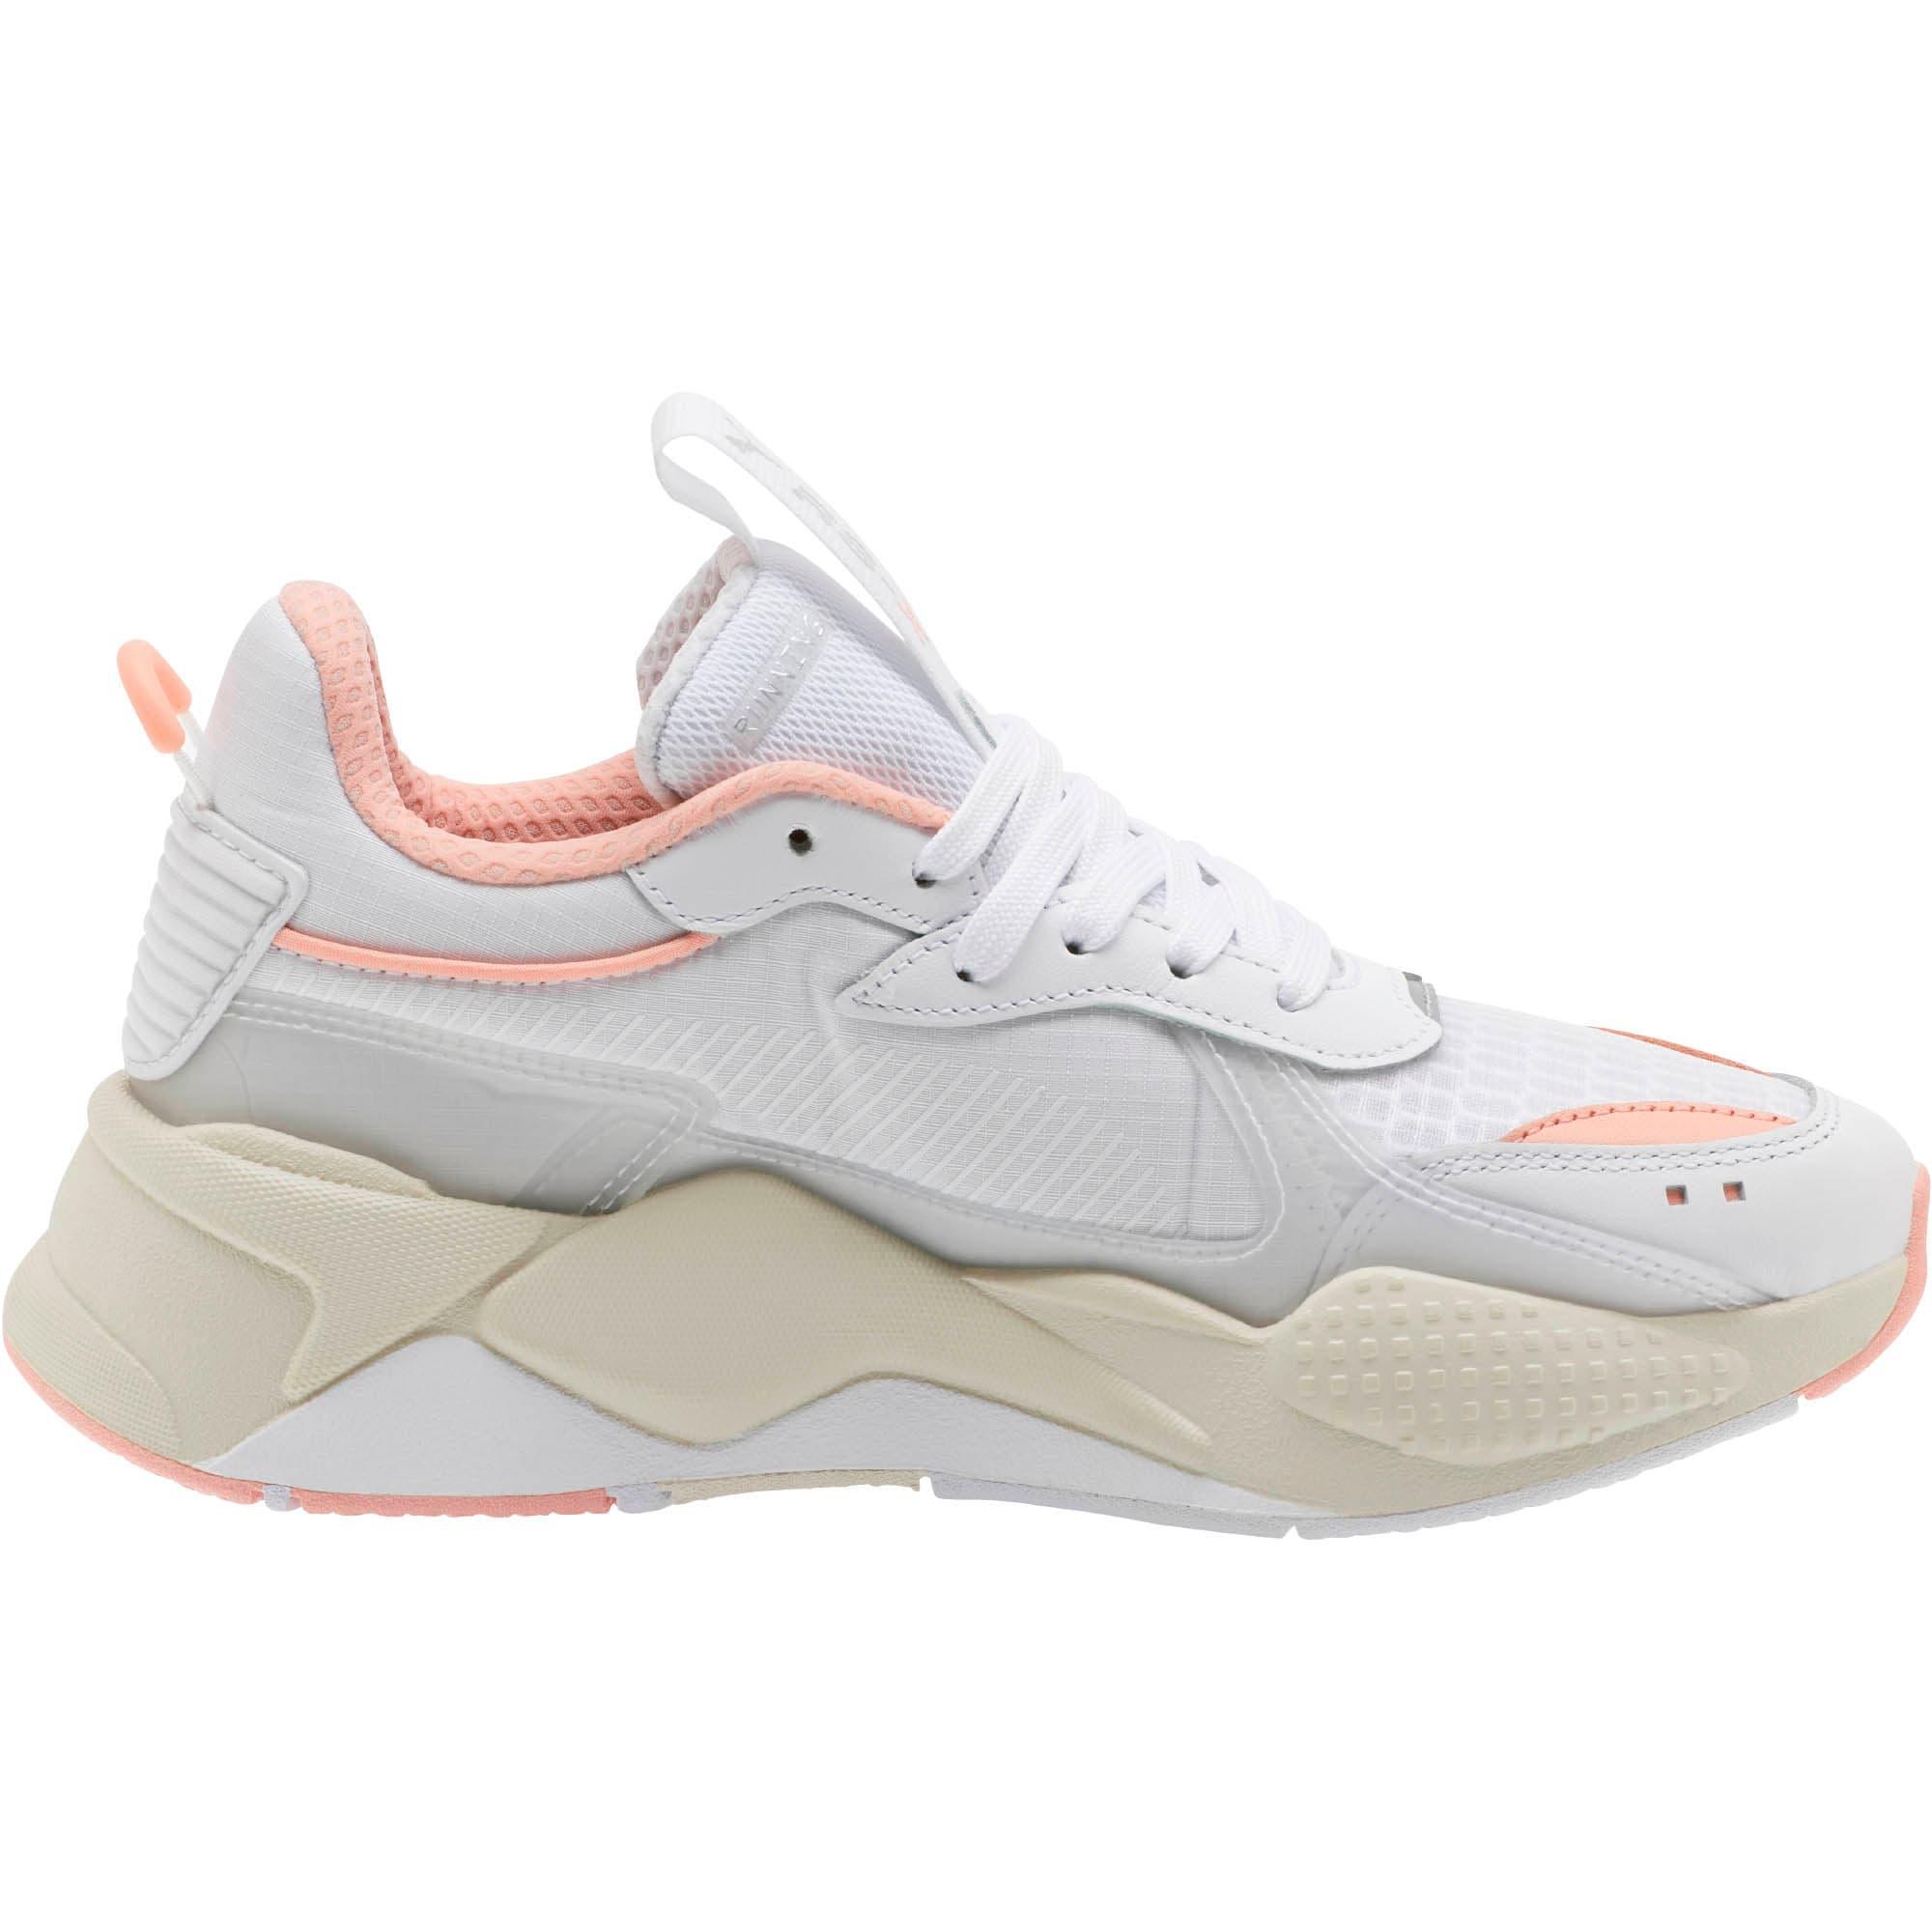 Thumbnail 4 of RS-X Tech Women's Sneakers, Puma White-Peach Bud, medium